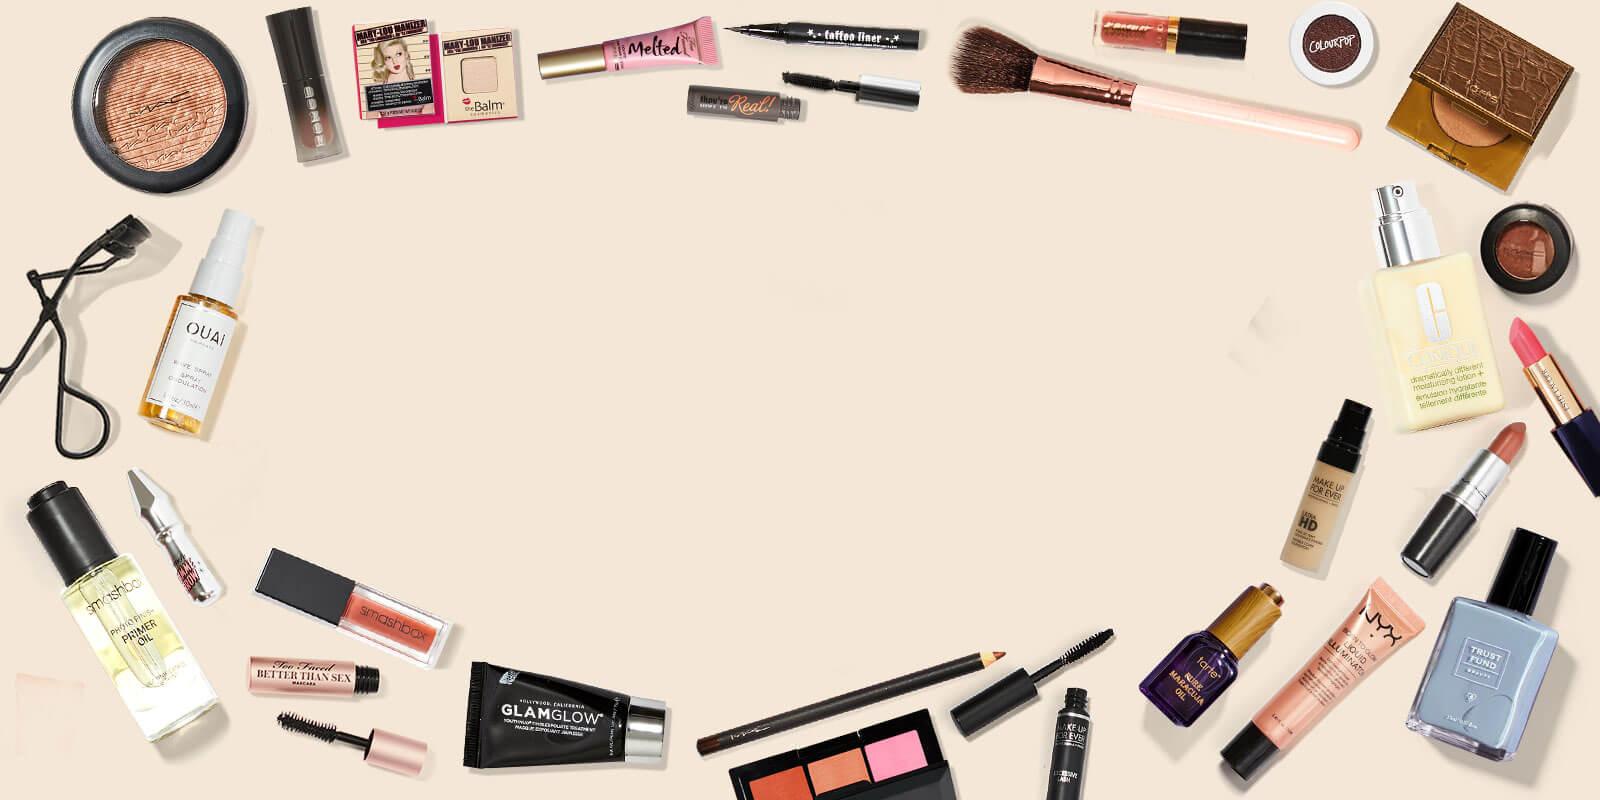 ipsy.com - The Most Rewarding Beauty Membership